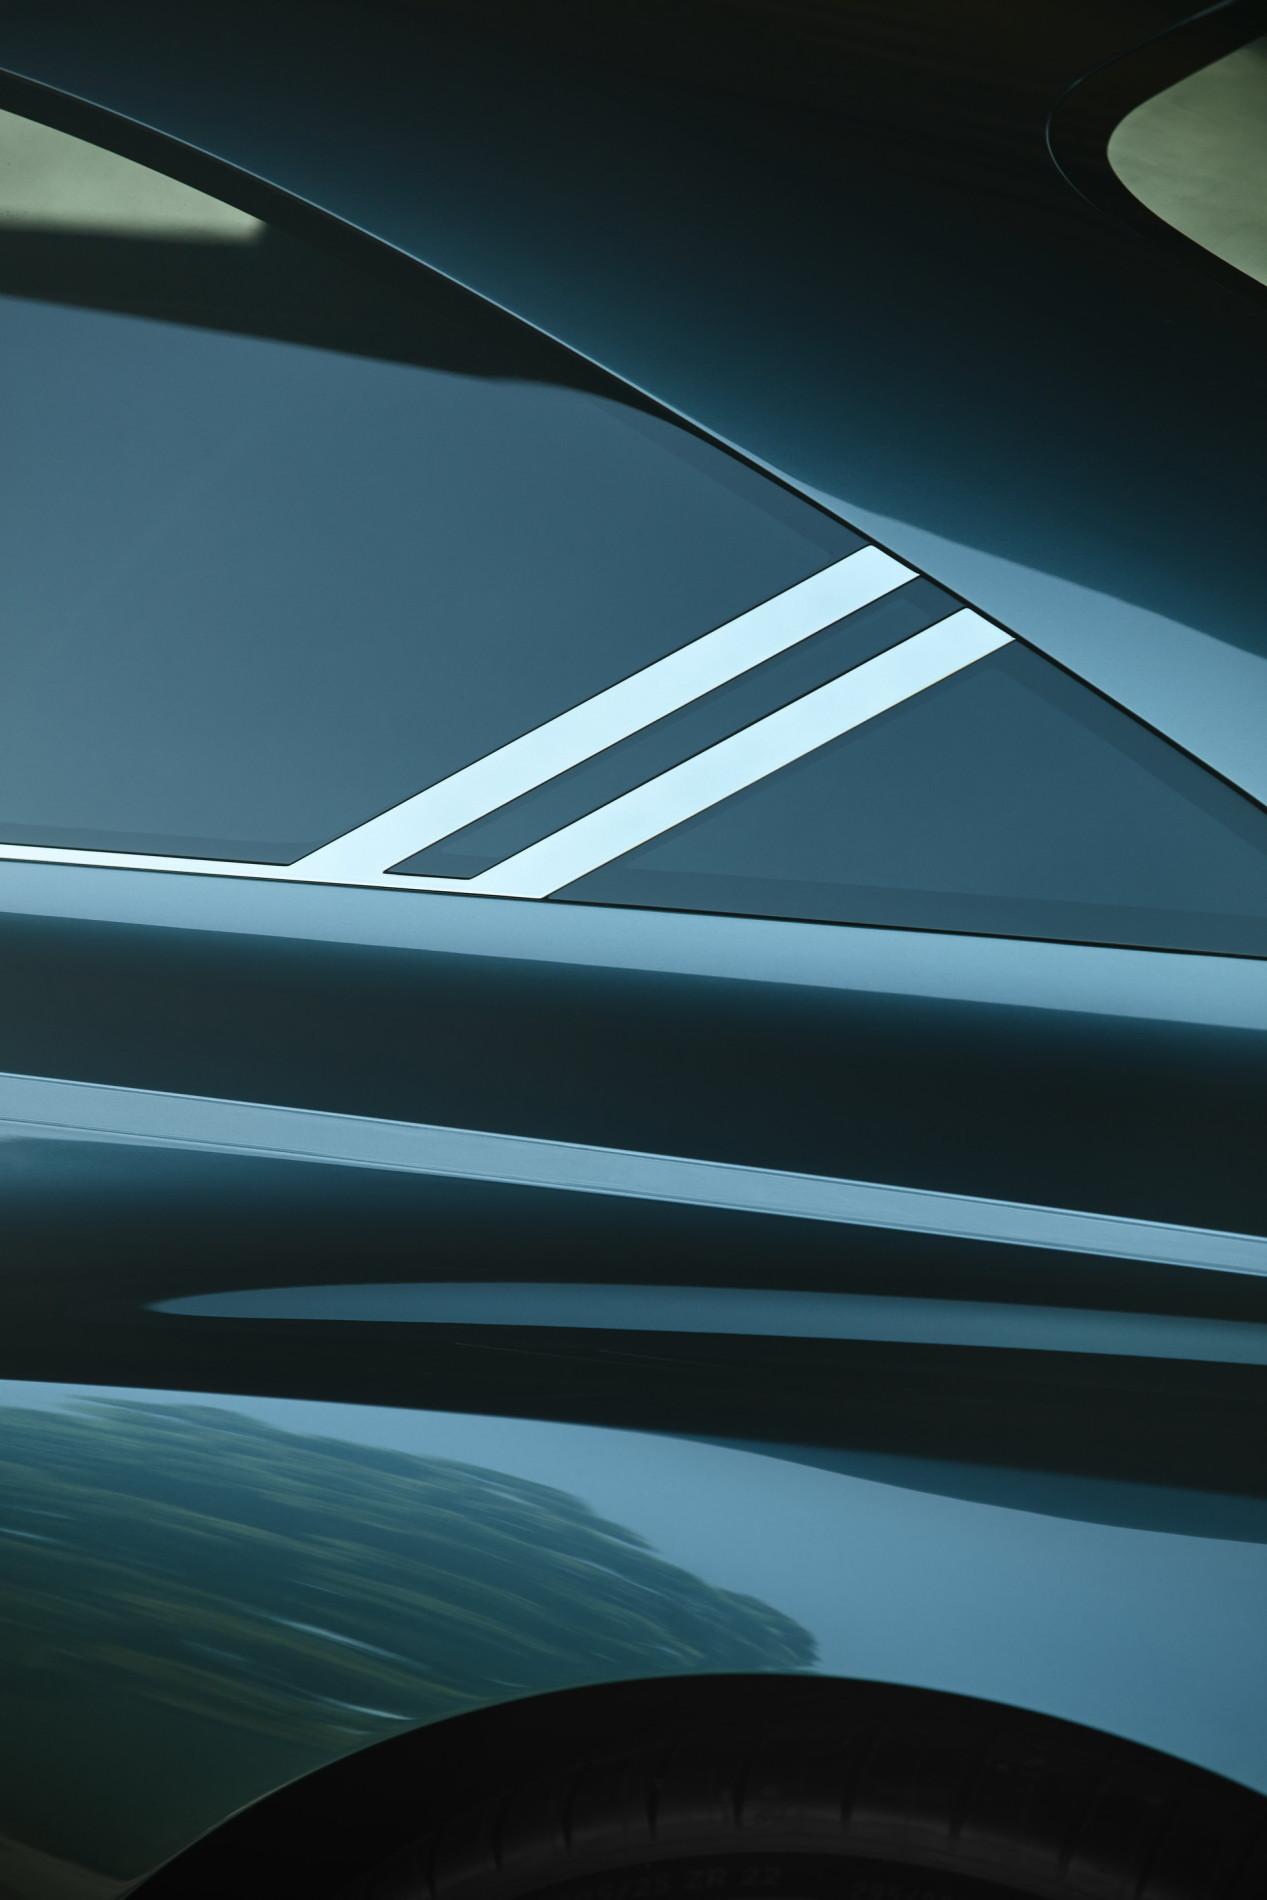 Genesis X Coupe Concept - Genesis X Coupe Concept